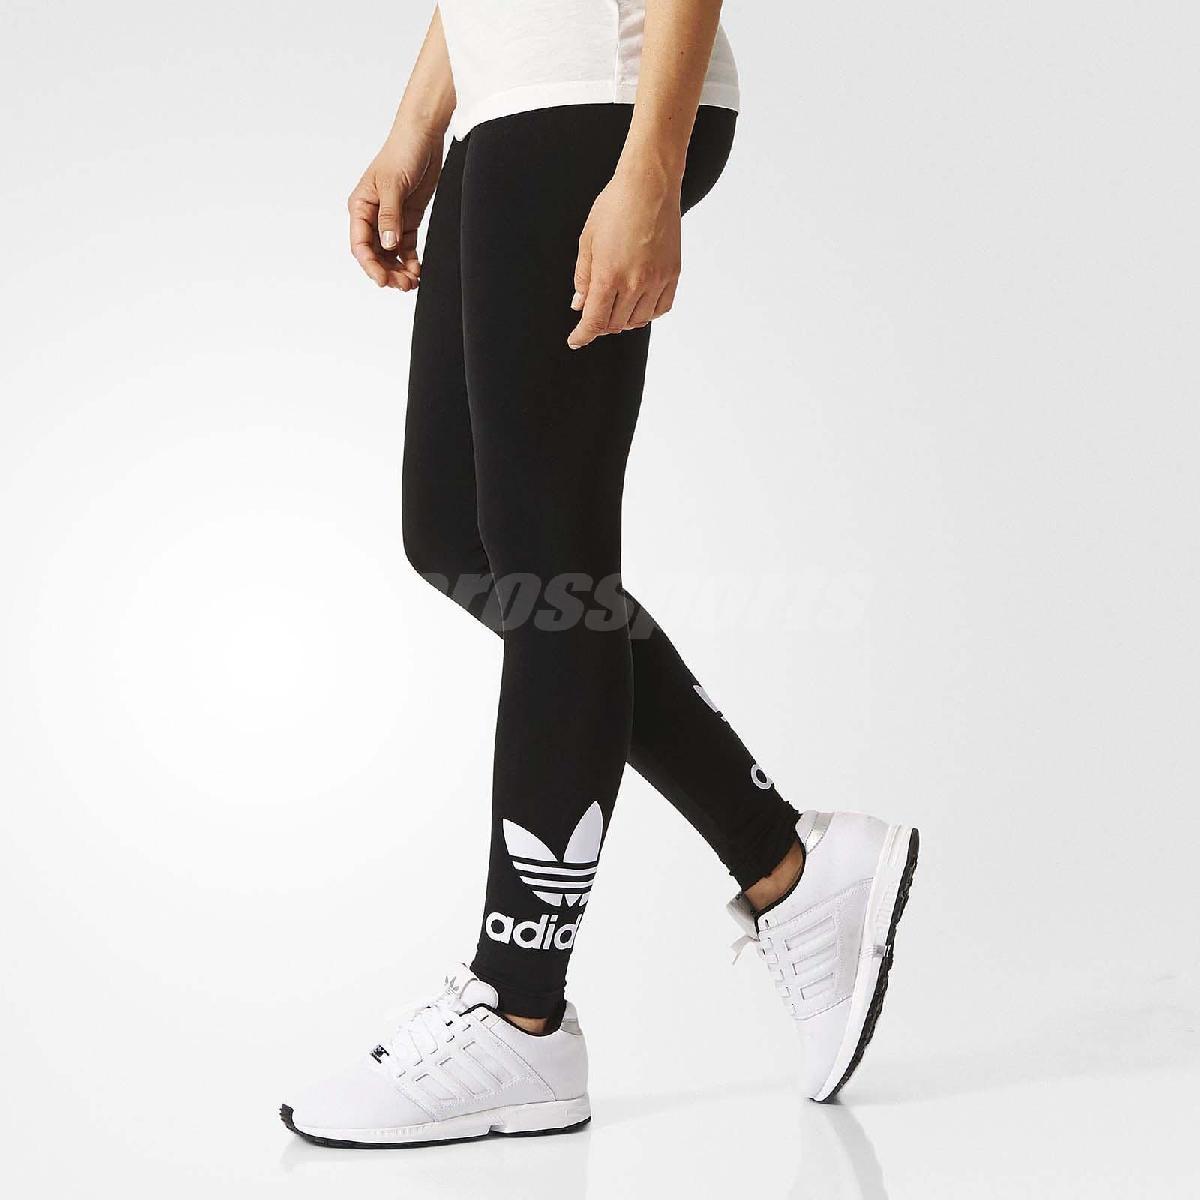 adidas 緊身褲 ORIGINALS TRF Leggings 長褲 內搭 女款 三葉草 復古 素面 運動 黑白 黑 白 【PUMP306】 AJ8153